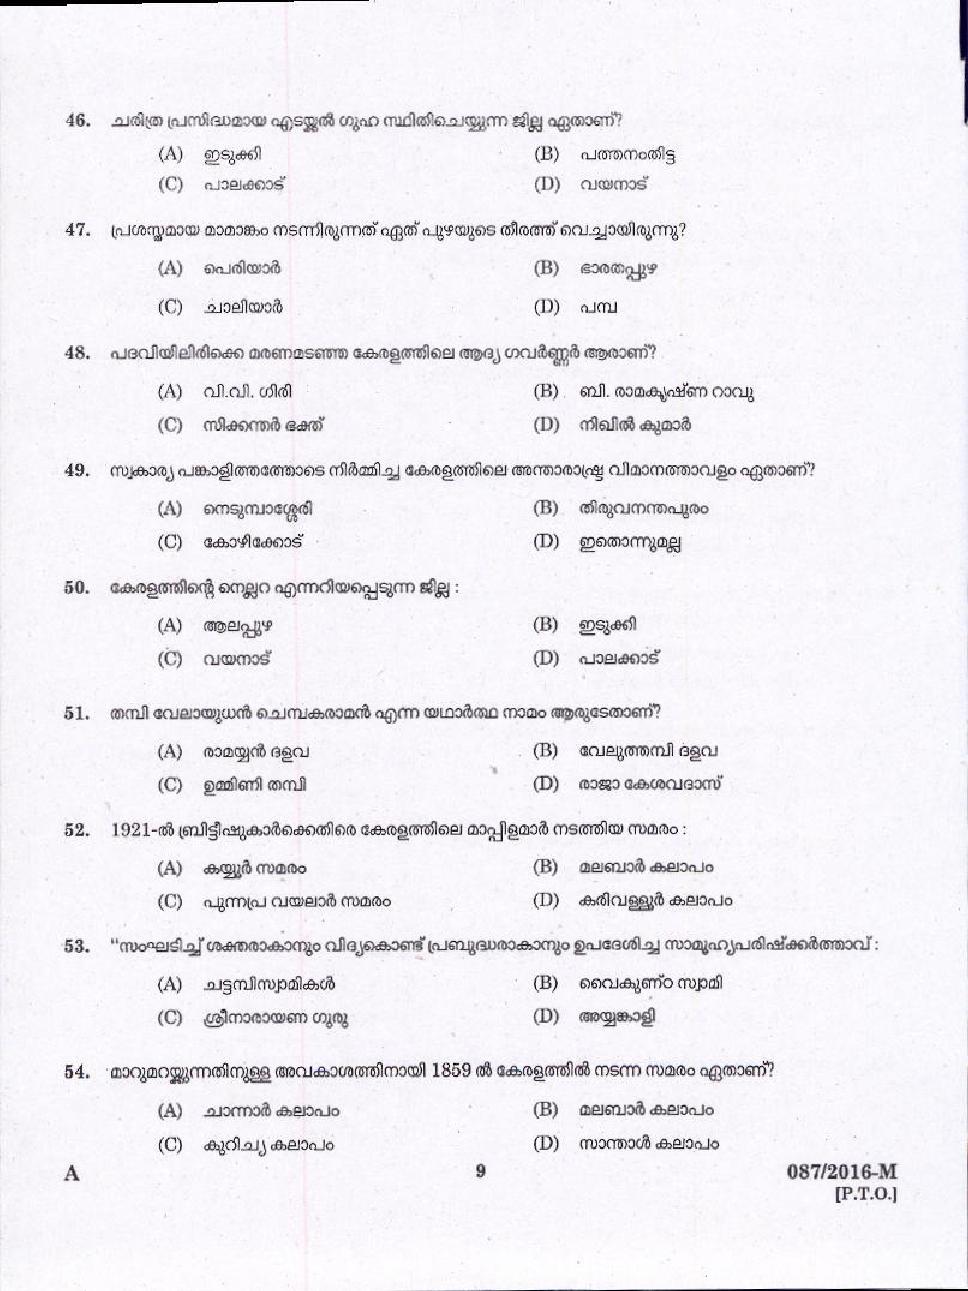 http://masterstudy.net//pdf/psc/village-extension-officer-gr-ii-rural-development/q_0872016-m0007.jpg